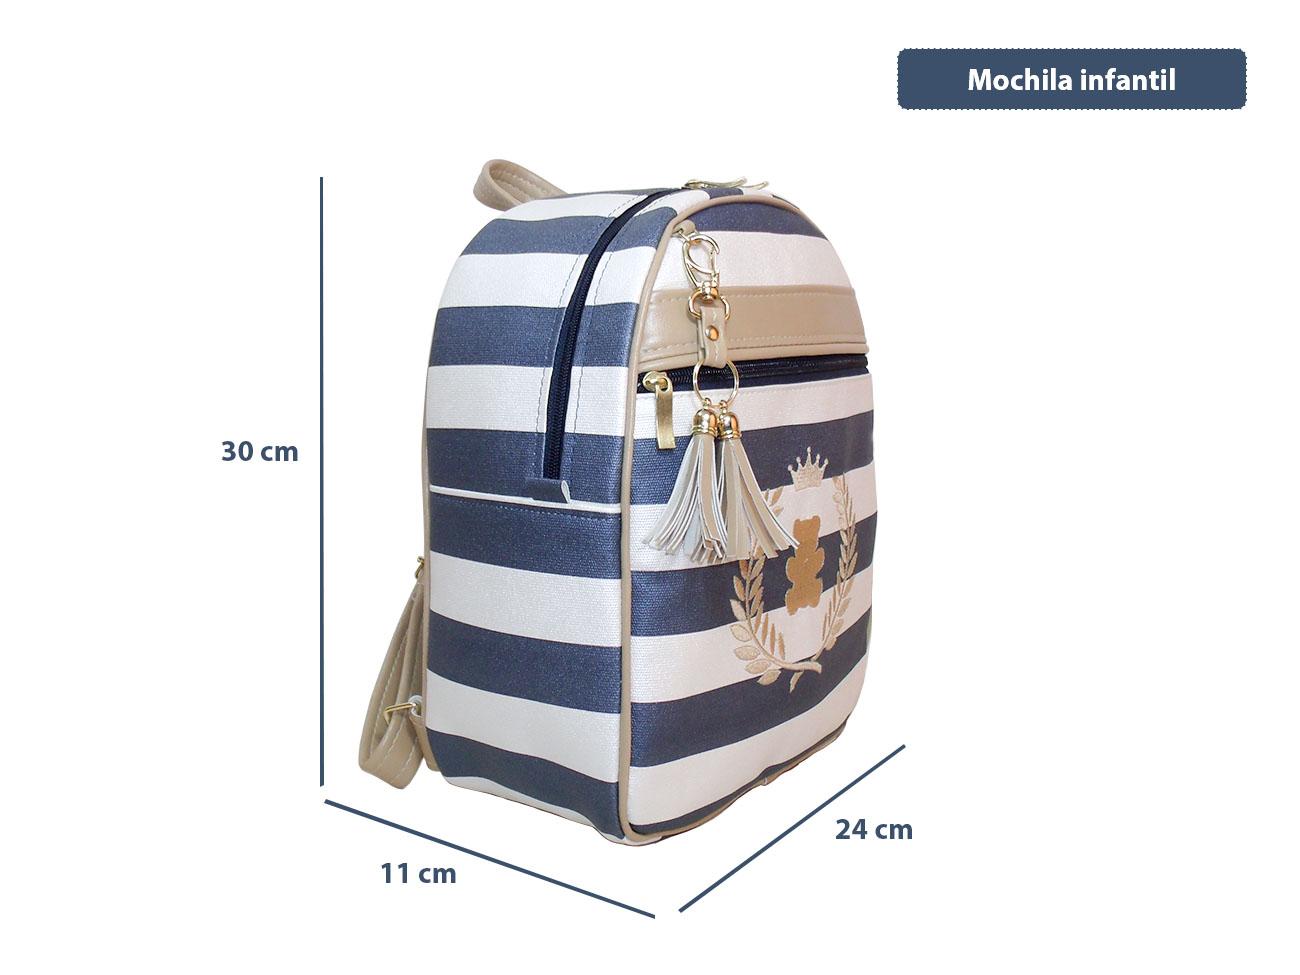 37624b402 Mochila Infantil (MC-BRLA01P) Personalizada no Elo7 | Ateliê Rose (A520EB)